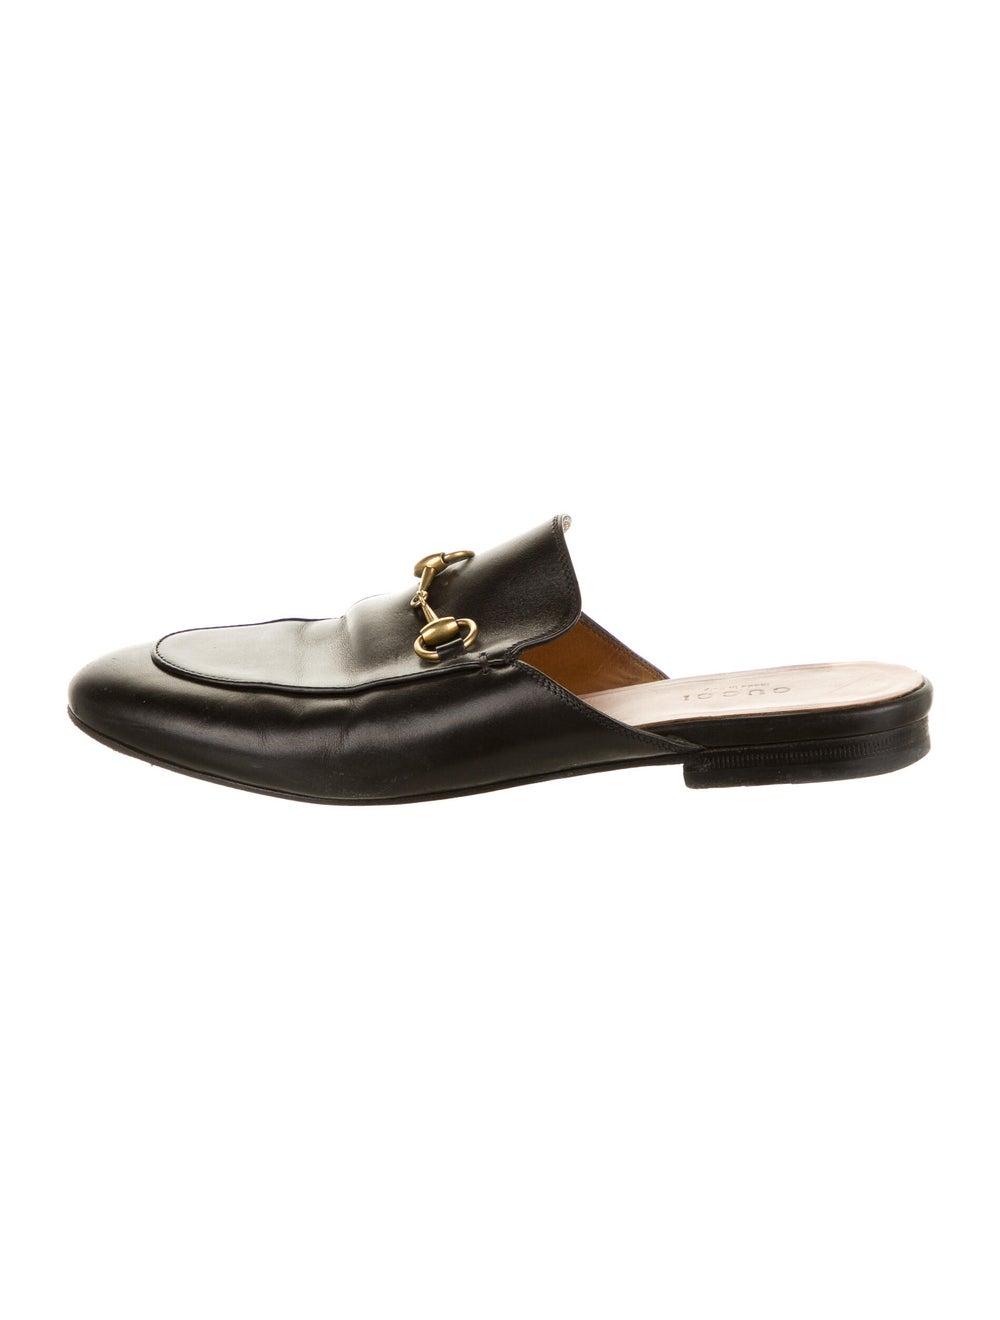 Gucci Horsebit Accent Leather Mules Black - image 1